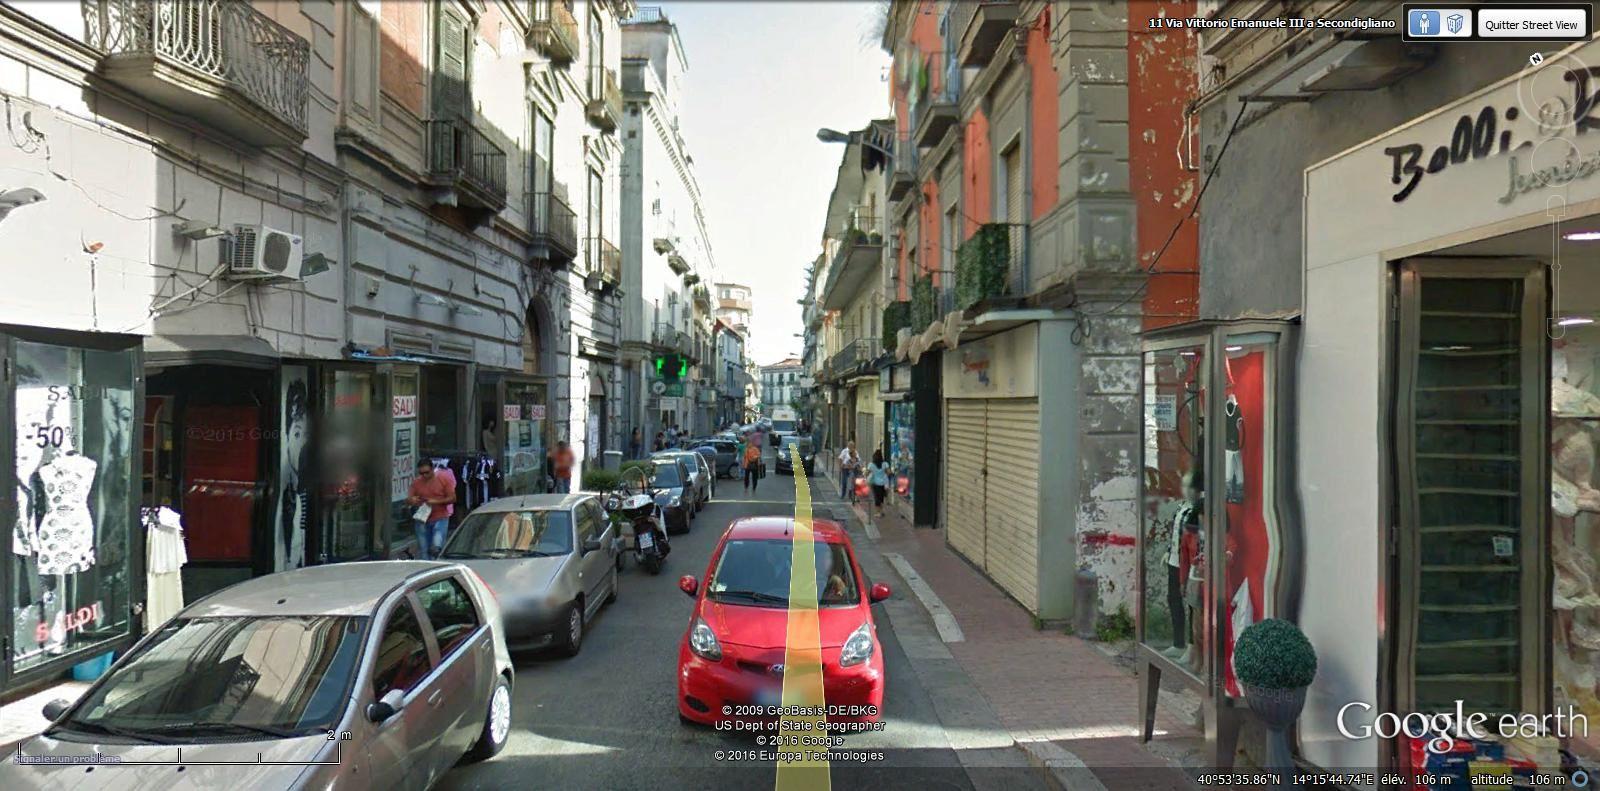 via Vittorio Emanuele III a Secondigliano